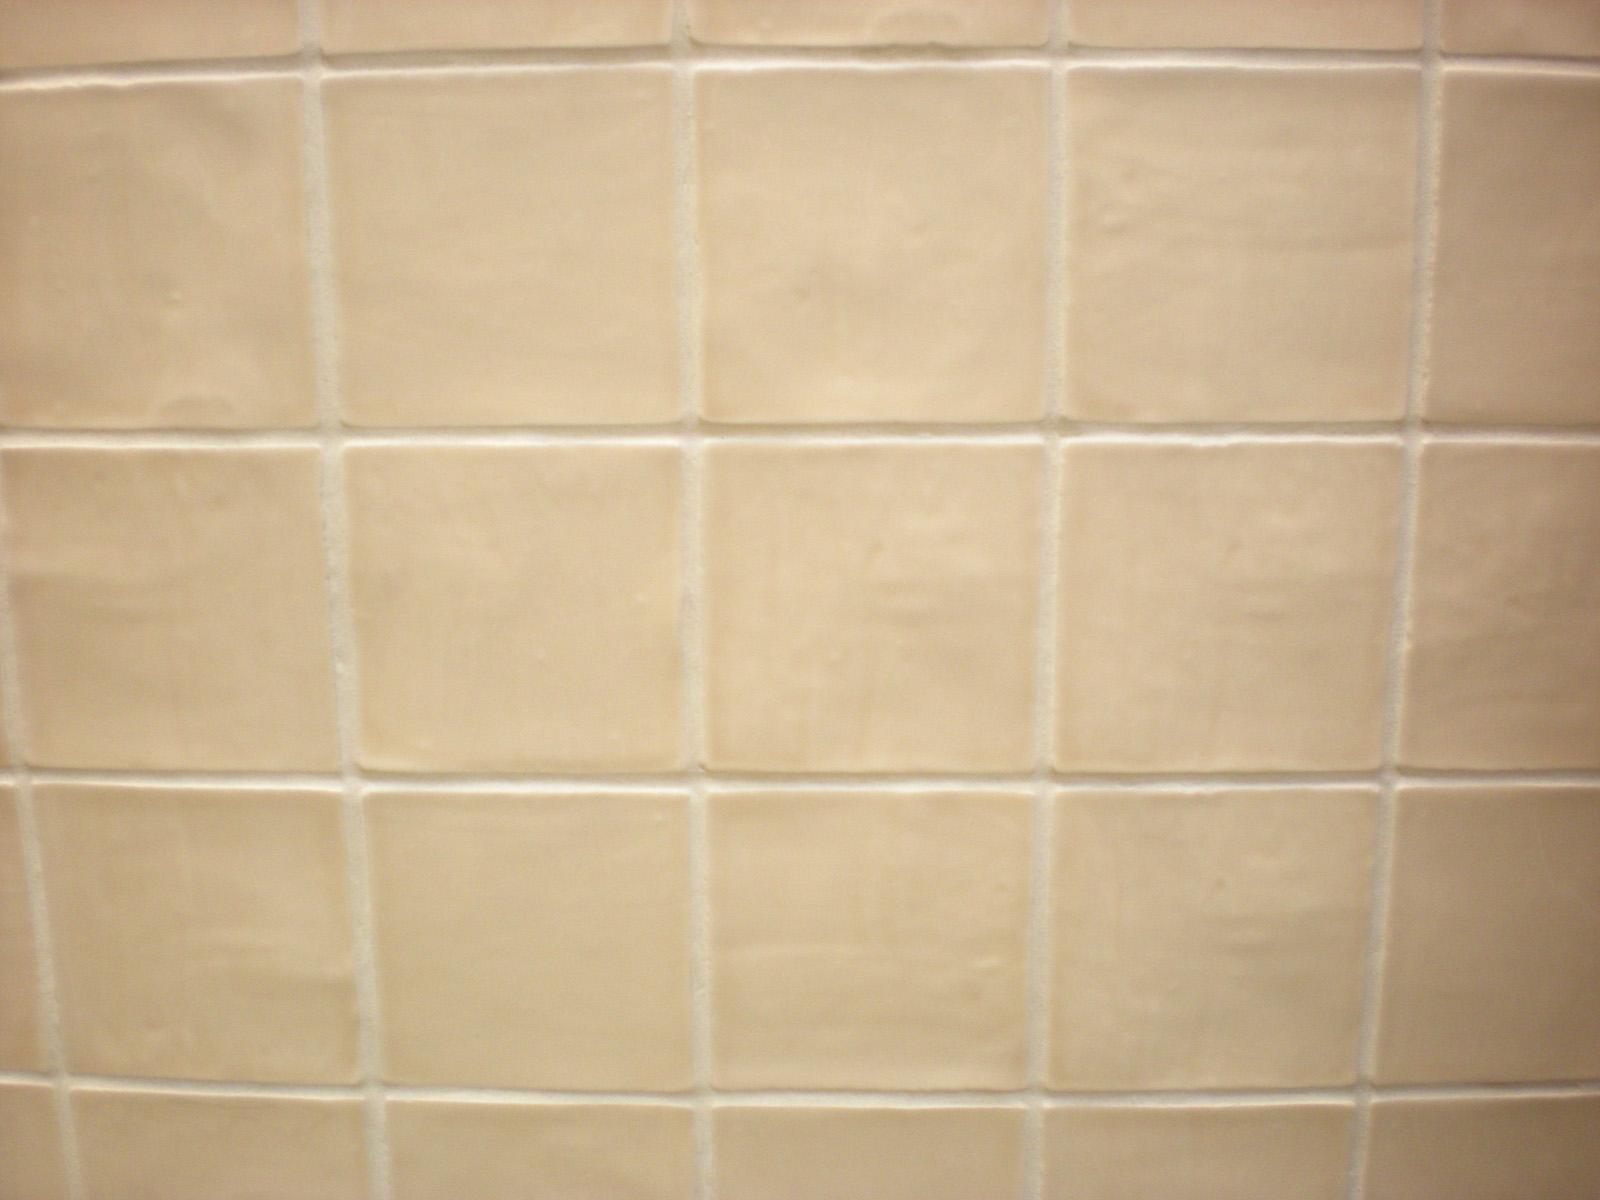 Diy Bathroom Floor Ceramic Tile : Kendal glazed ceramic wall tiles diy kitchen bathroom